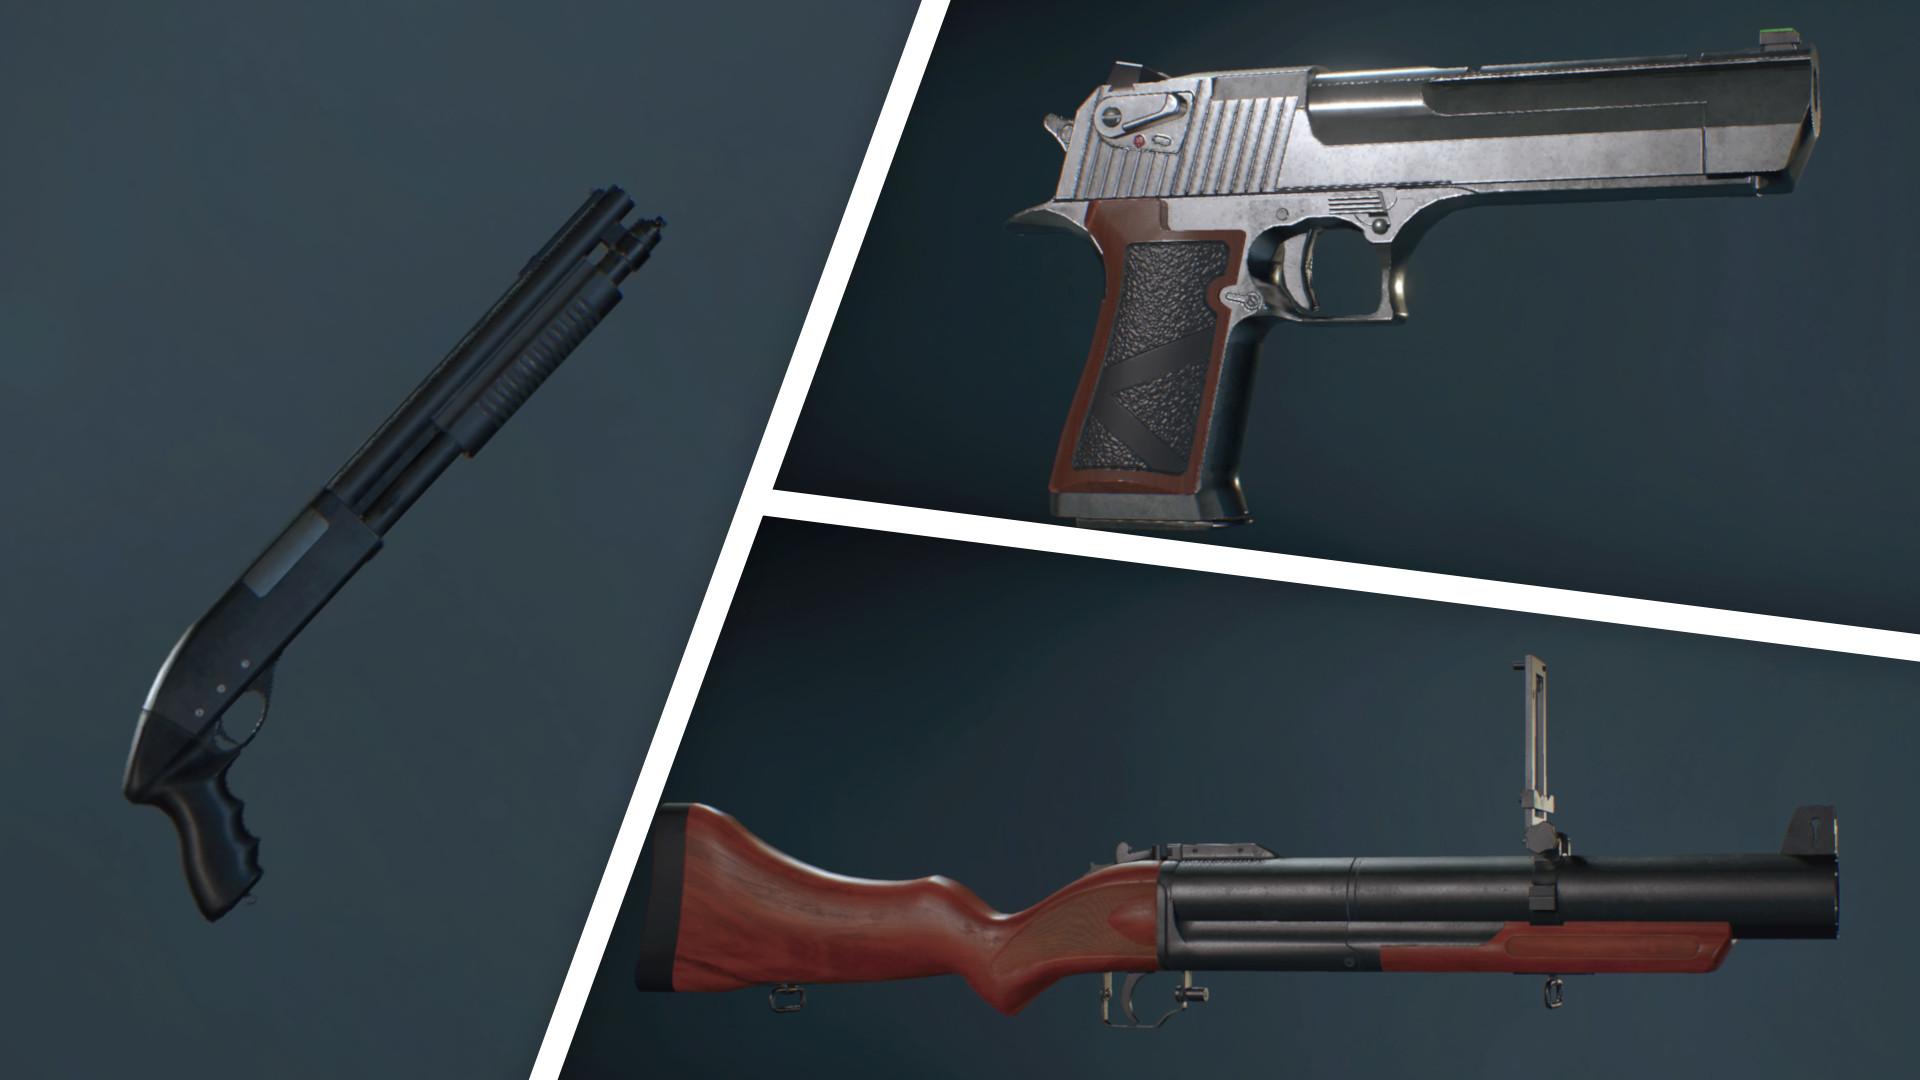 Mq 11 Maschinenpistole Alle Waffen Fundorte In Resident Evil 2